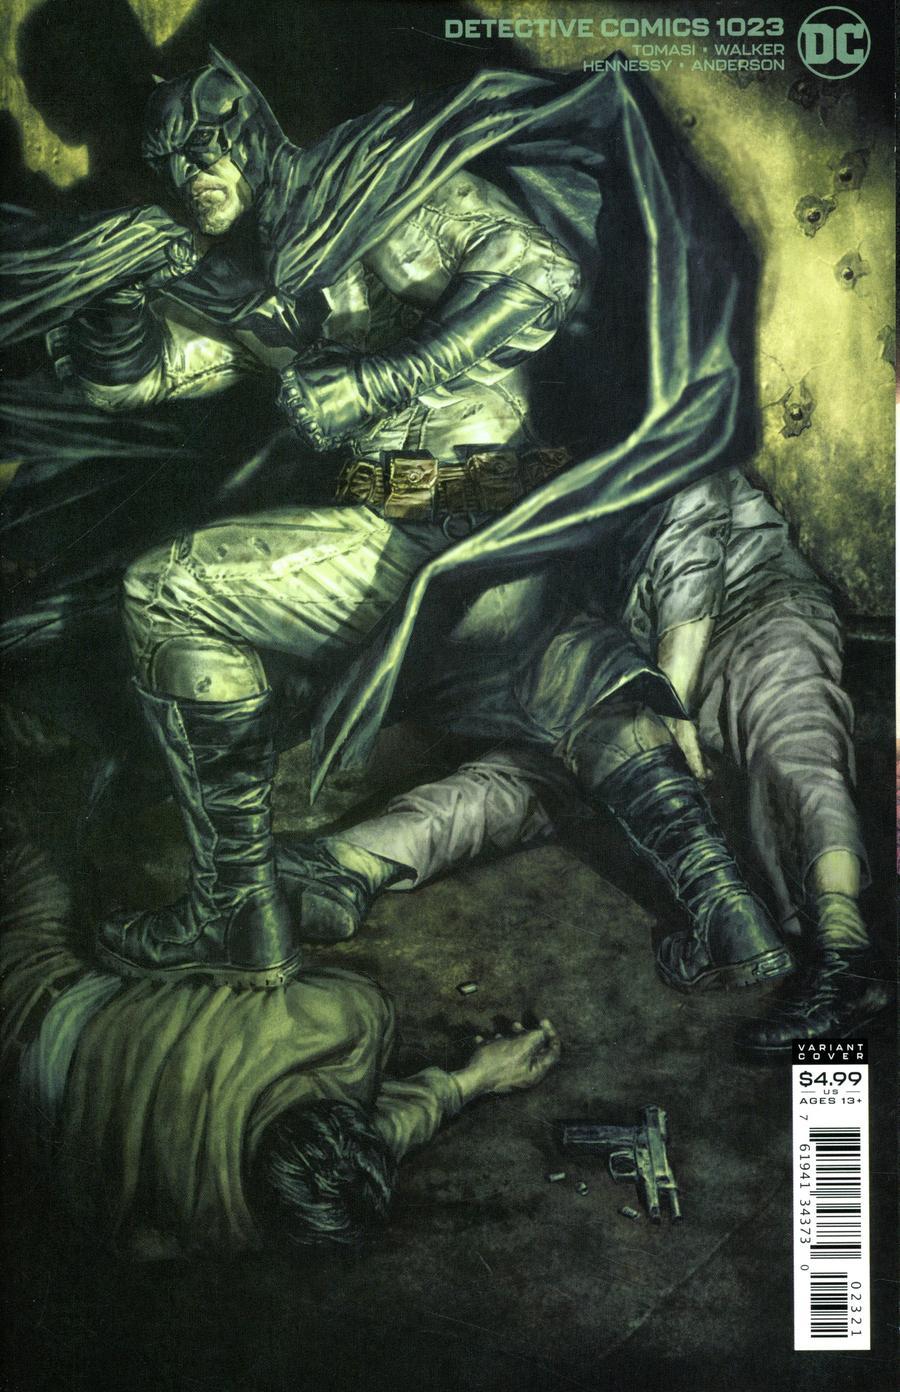 Detective Comics Vol 2 #1023 Cover B Variant Lee Bermejo Card Stock Cover (Joker War Tie-In)